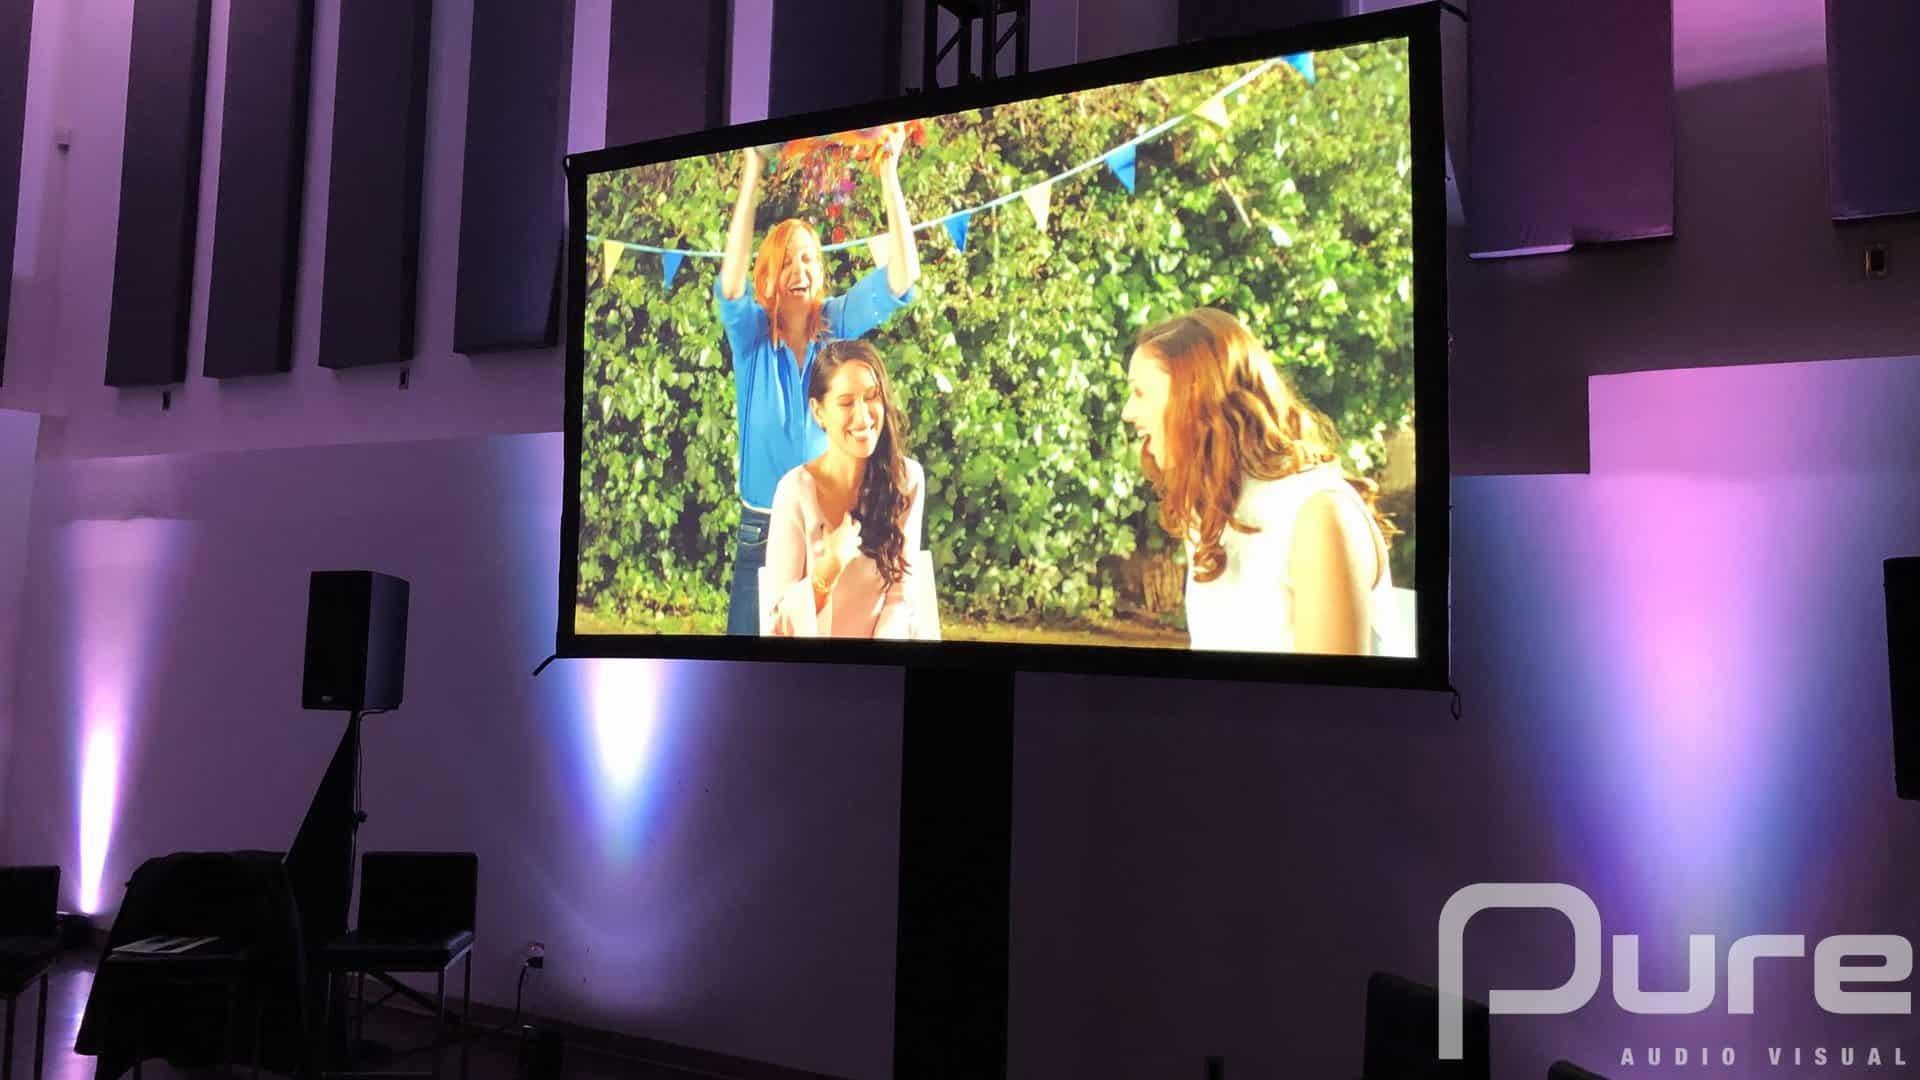 Corporate event screen projector rental